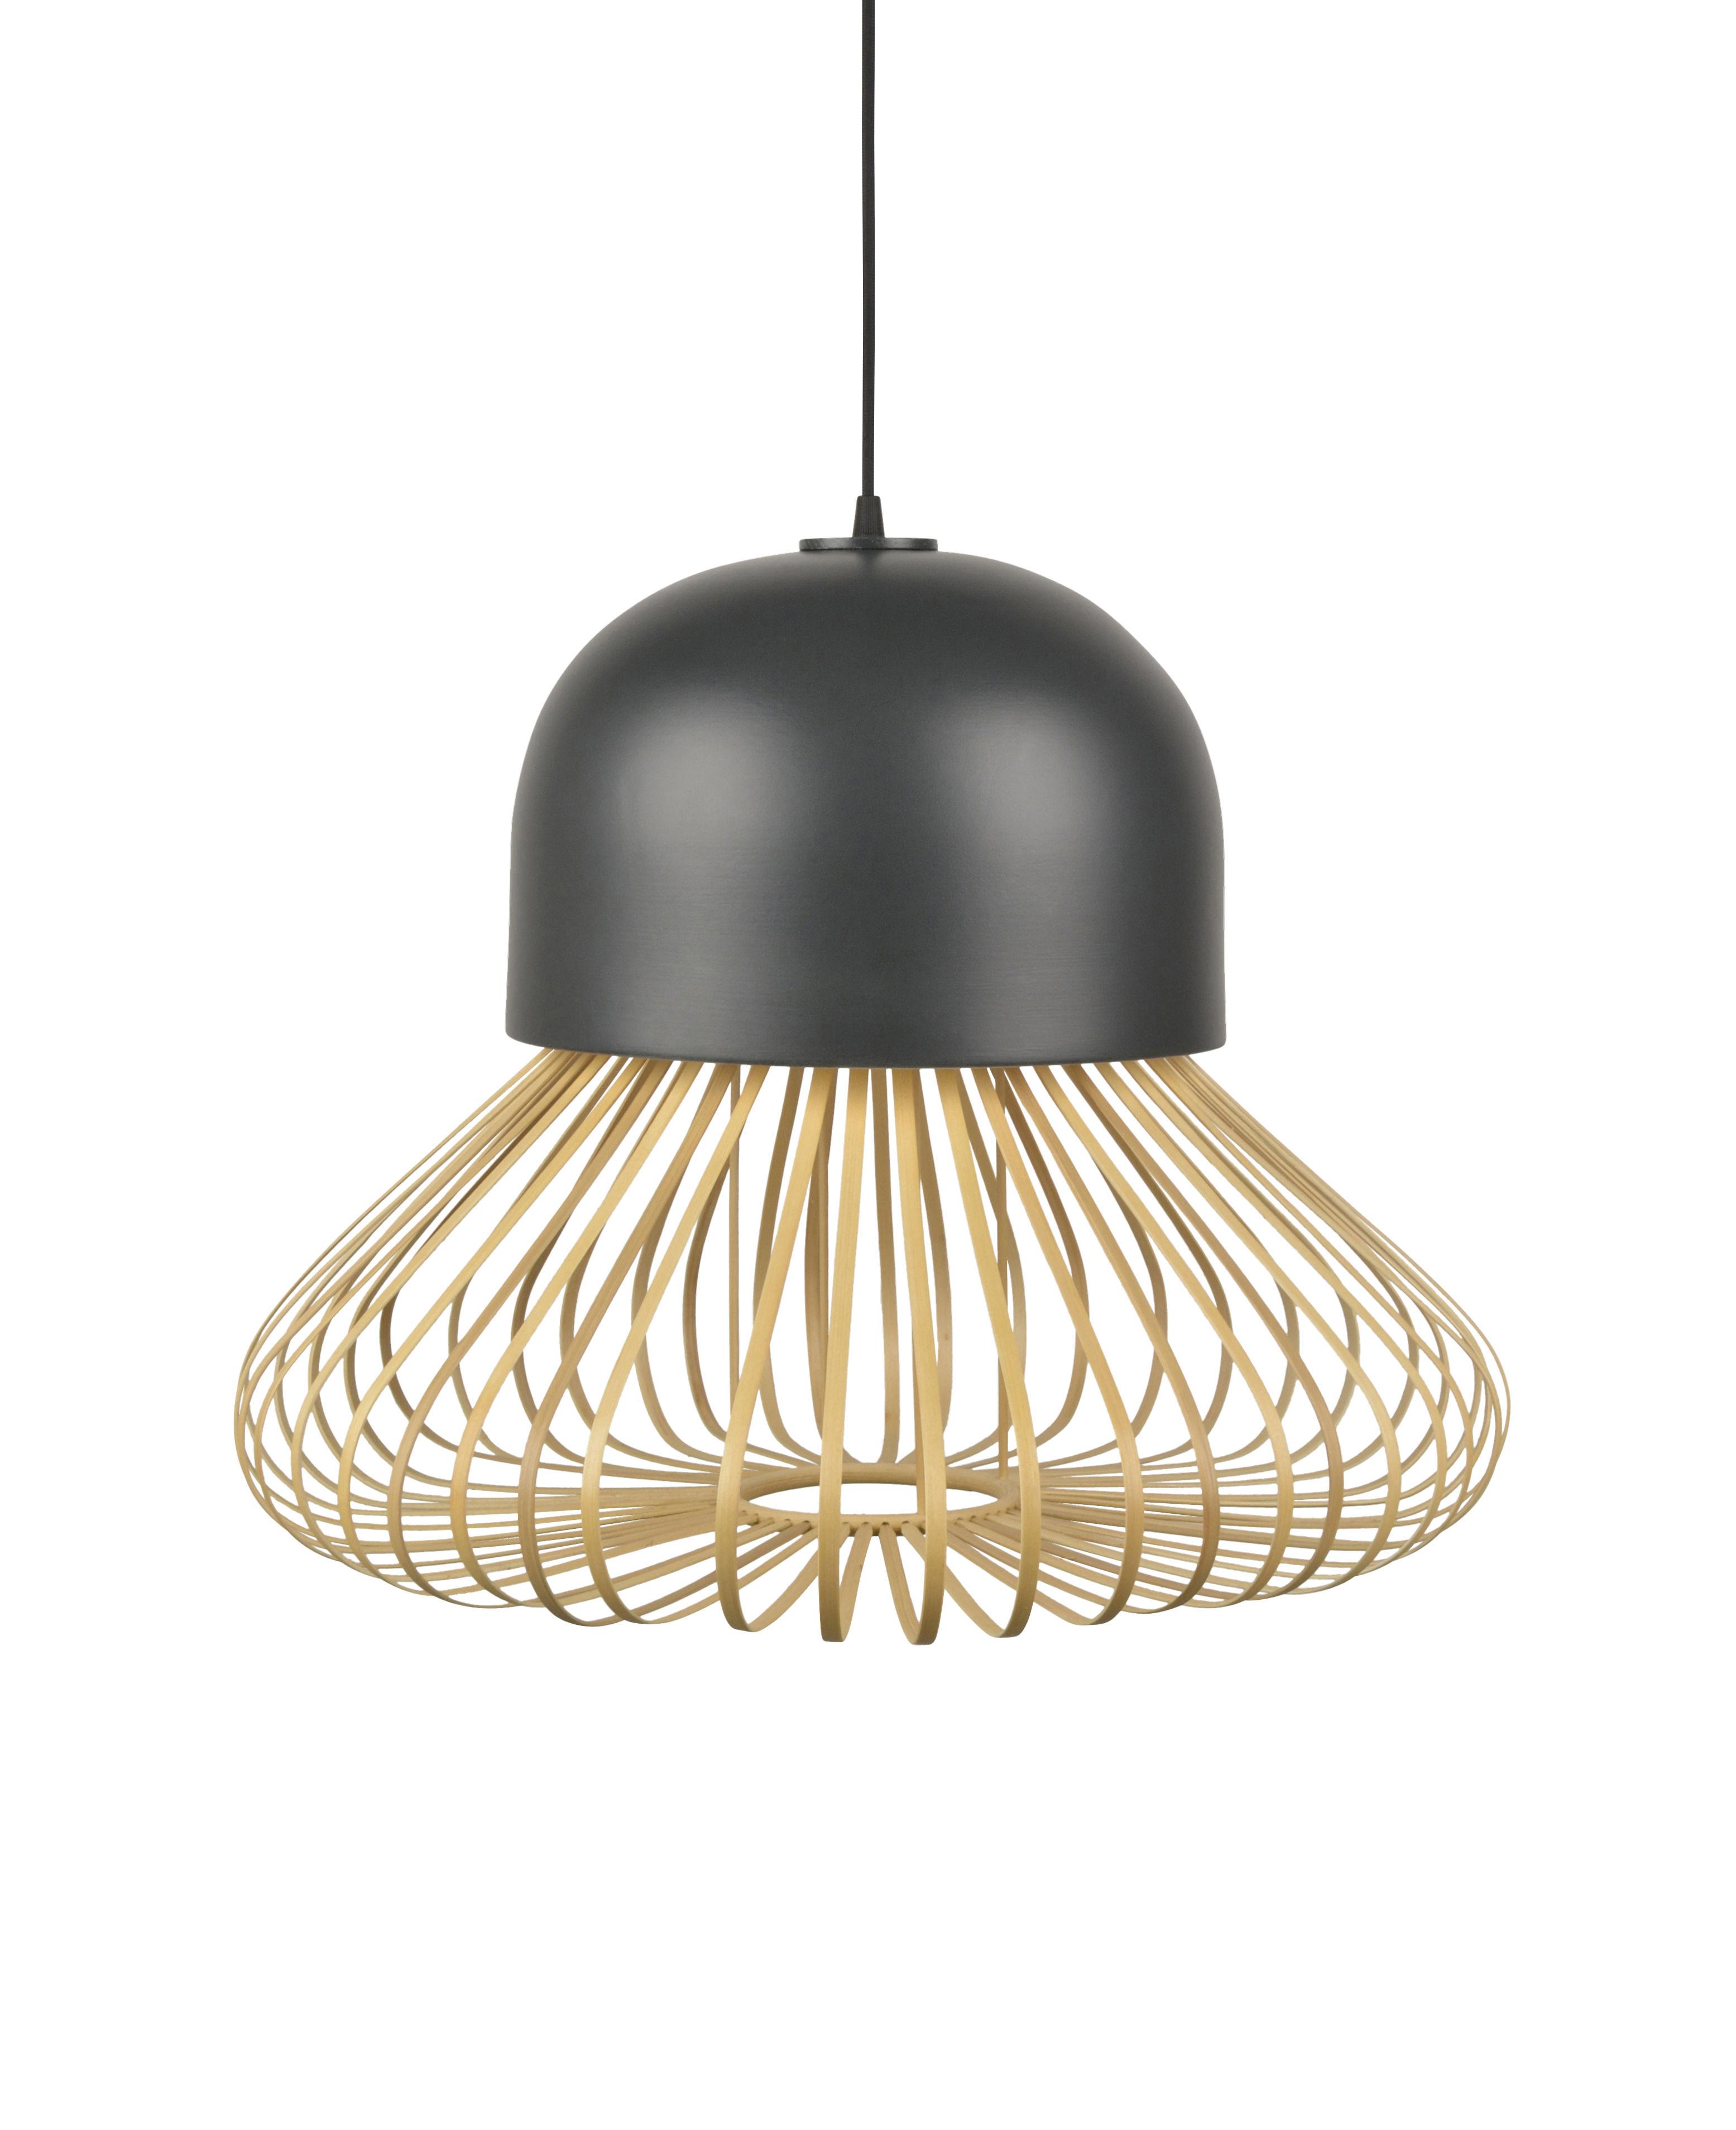 Illuminazione - Lampadari - Sospensione Anemos Large - / Ø 55 x H 42 cm - Bambù & ceramica di Forestier - Large / Antracite & naturale - Bambù, Ceramica smaltata